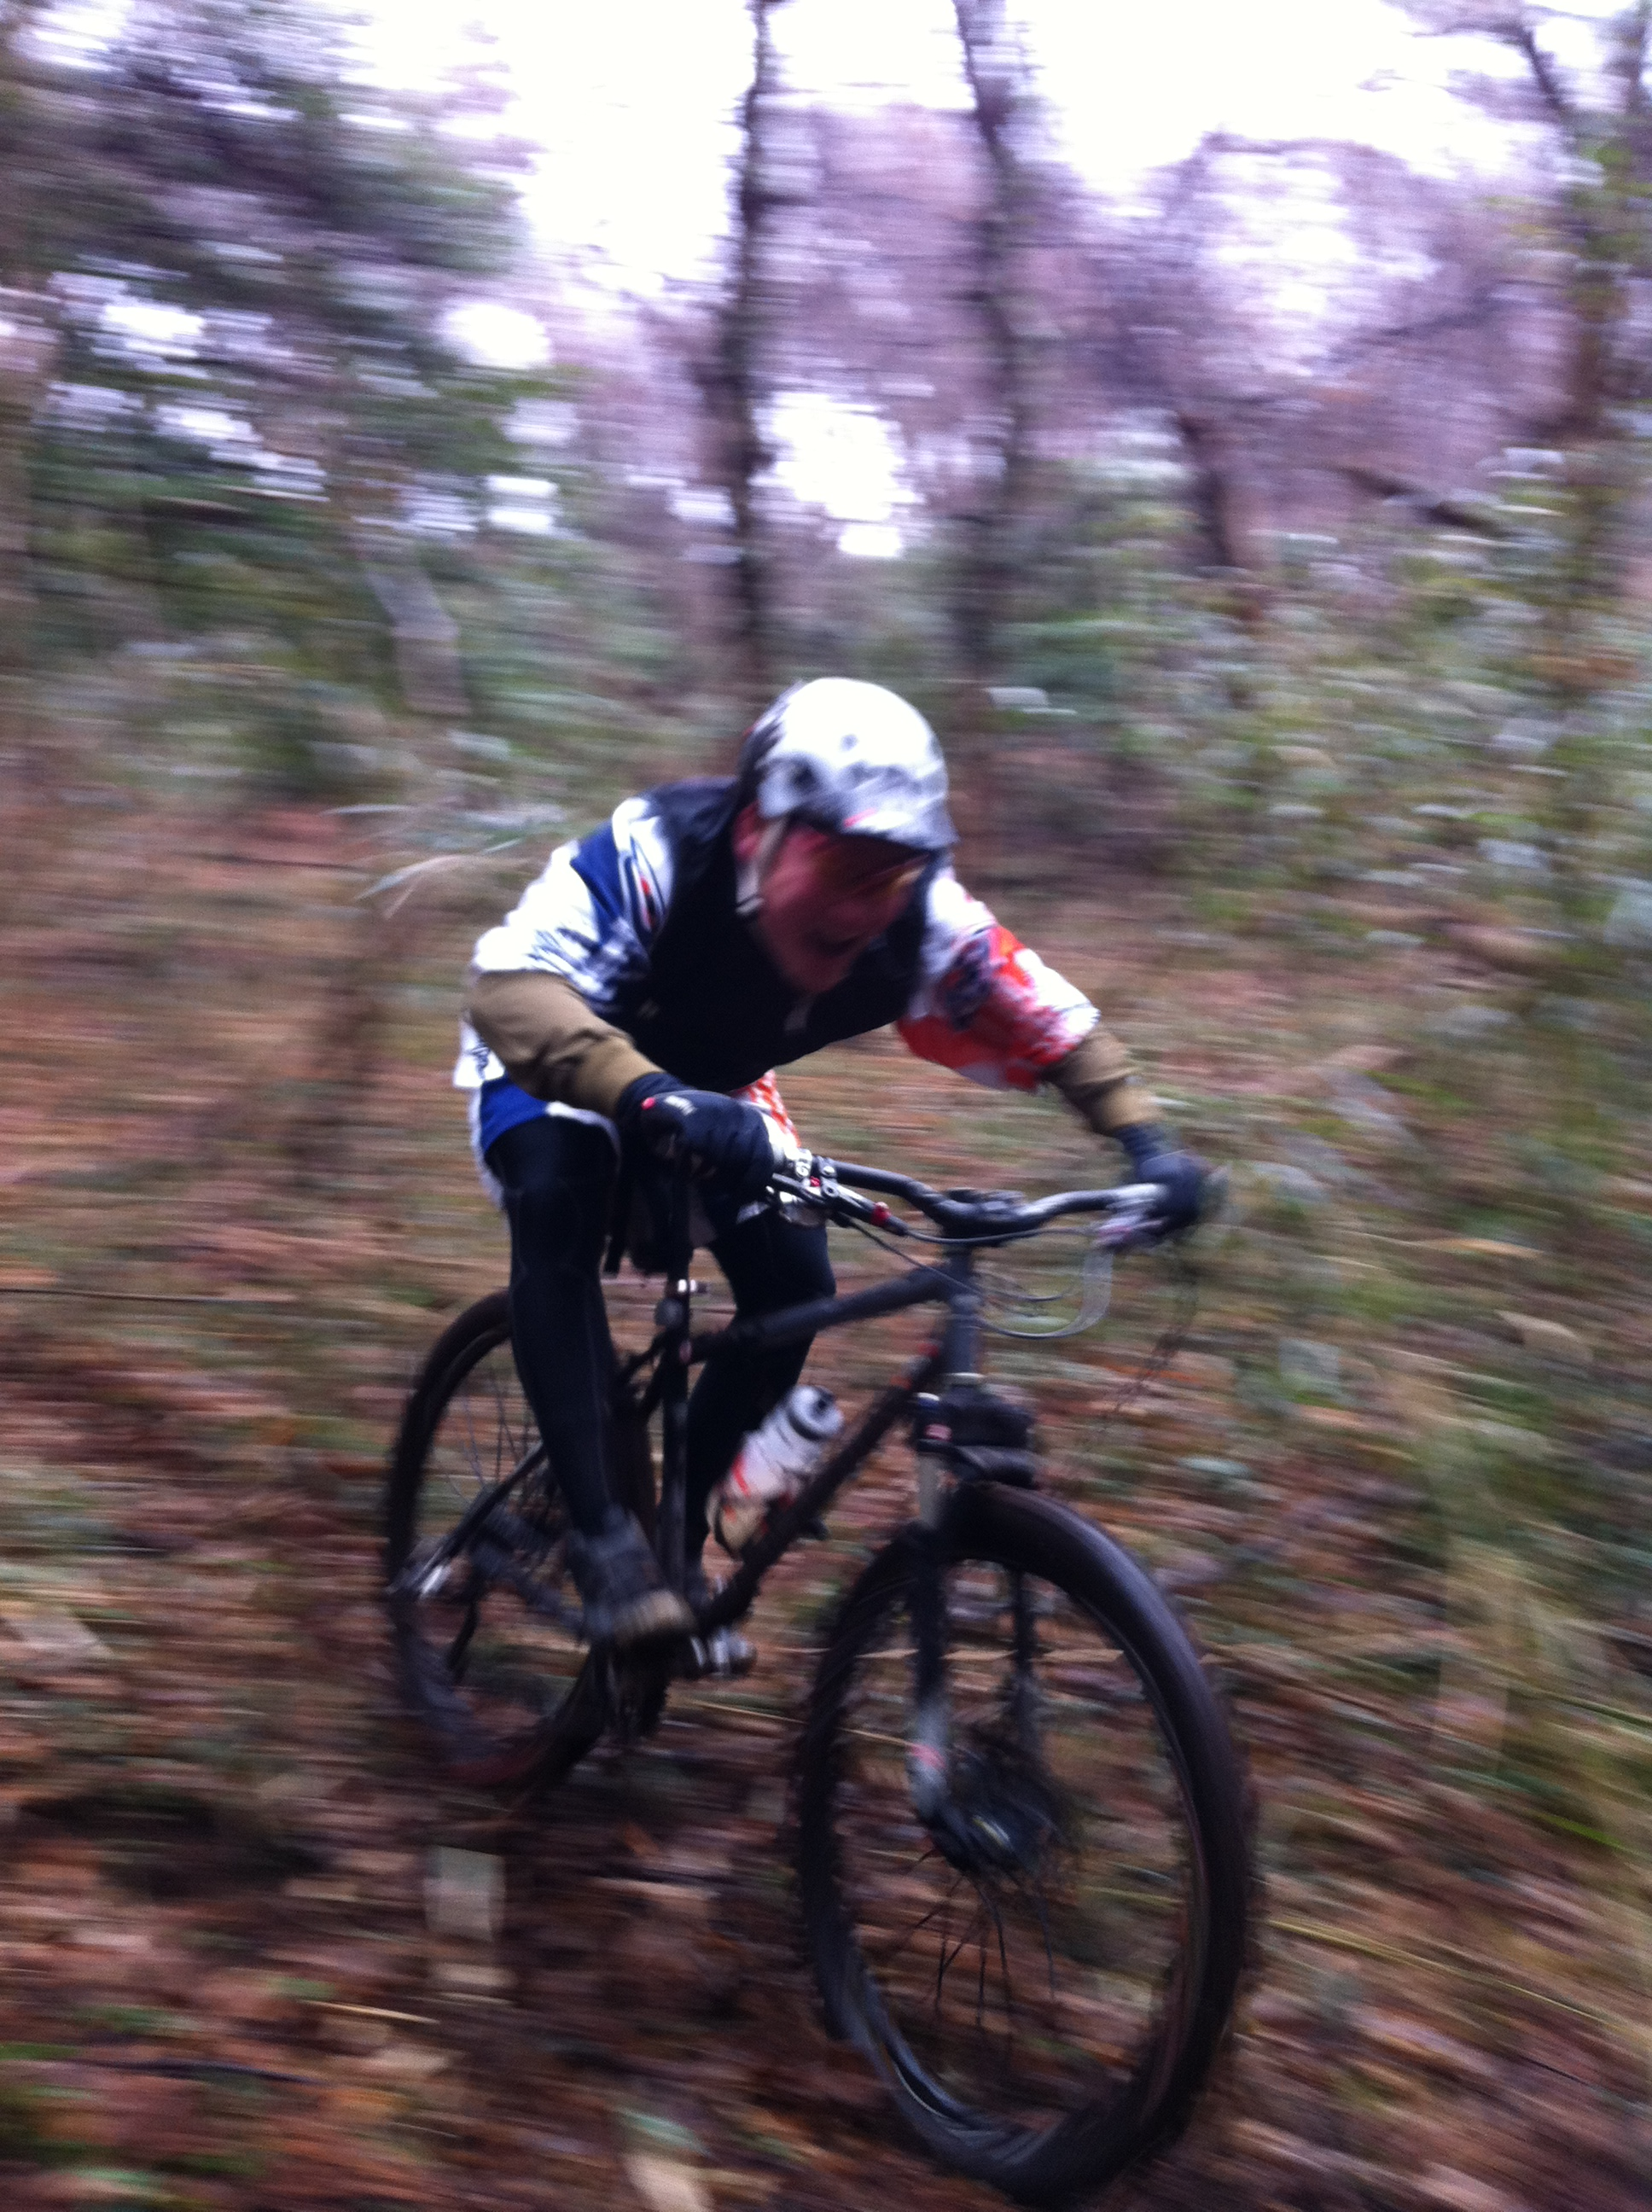 http://cycleshop-fun.com/images/926.JPG